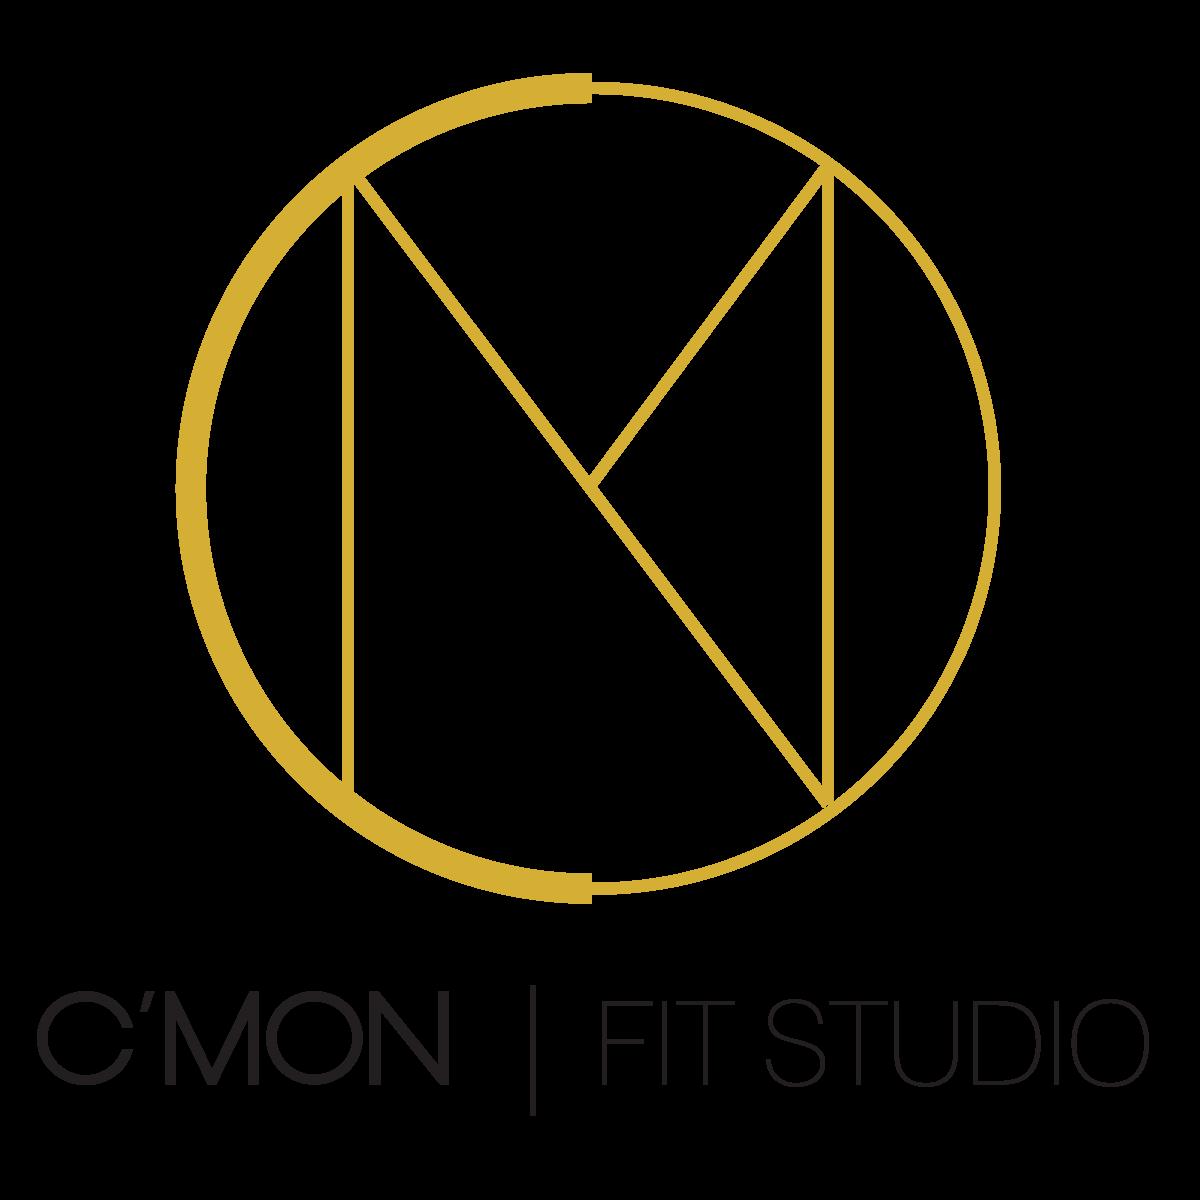 C'mon studio